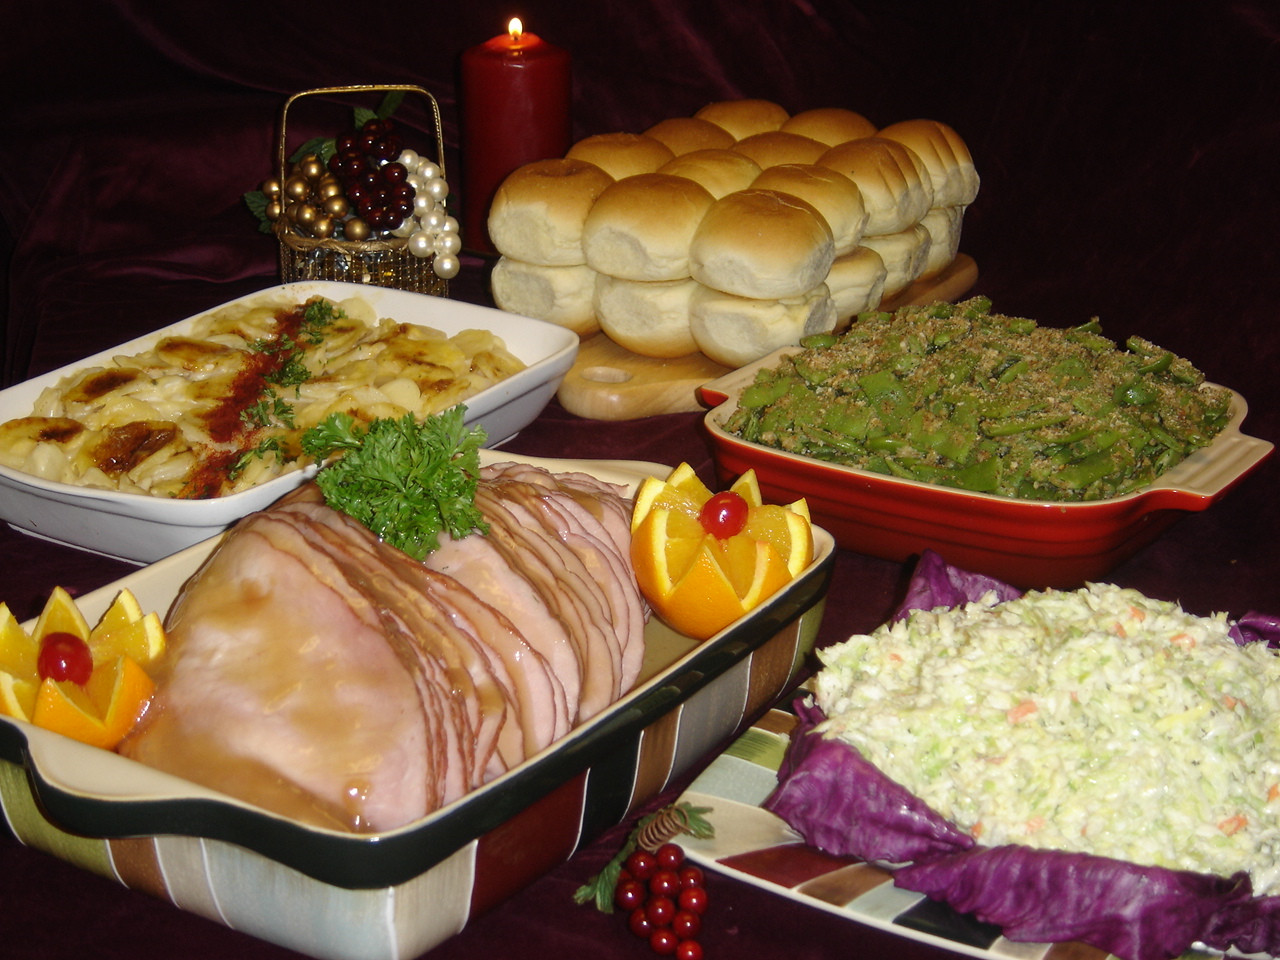 Prepared Easter Dinners  Hop into Schiff's for Easter Dinner made easy